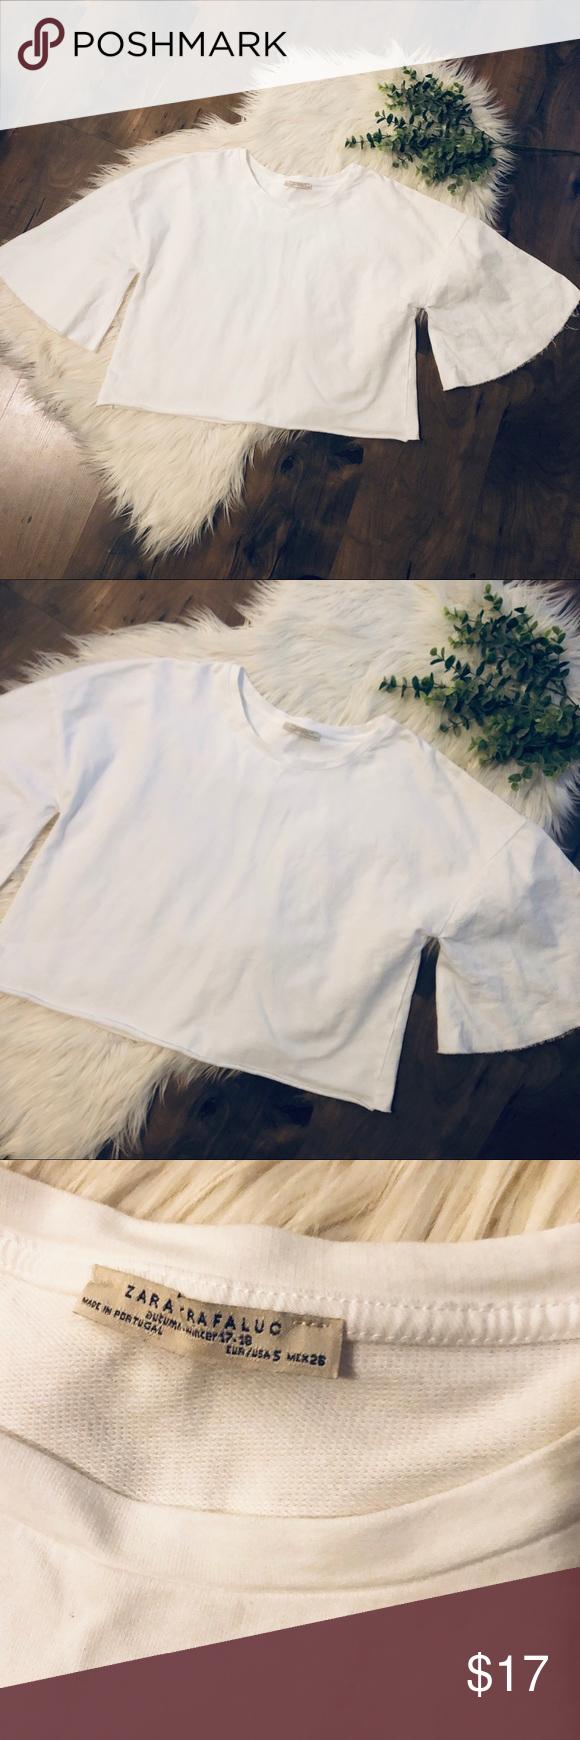 Zara Crop Top Zara Trafaluc white Crop Top Size small 100% cotton So many ways t…